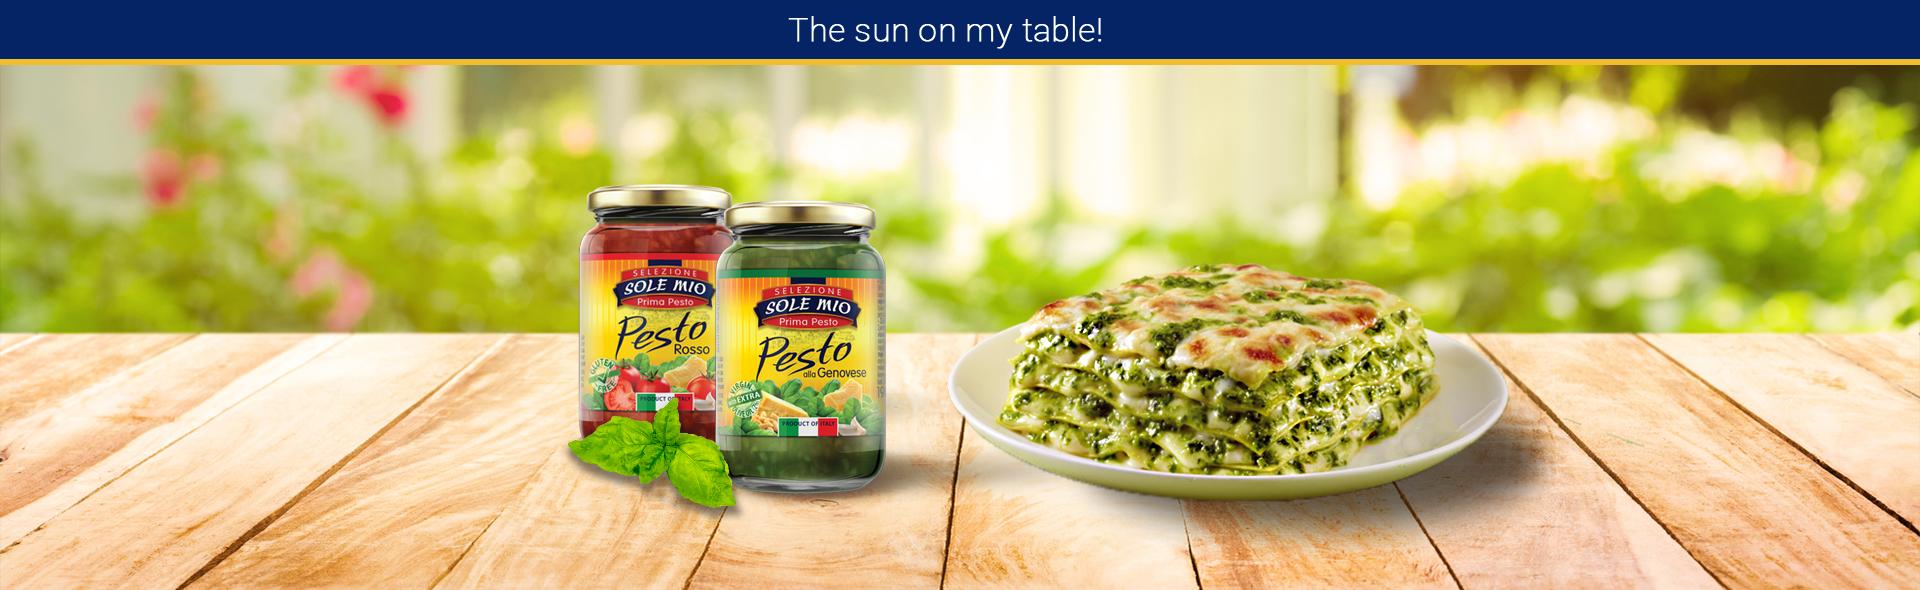 Pesto Sauces